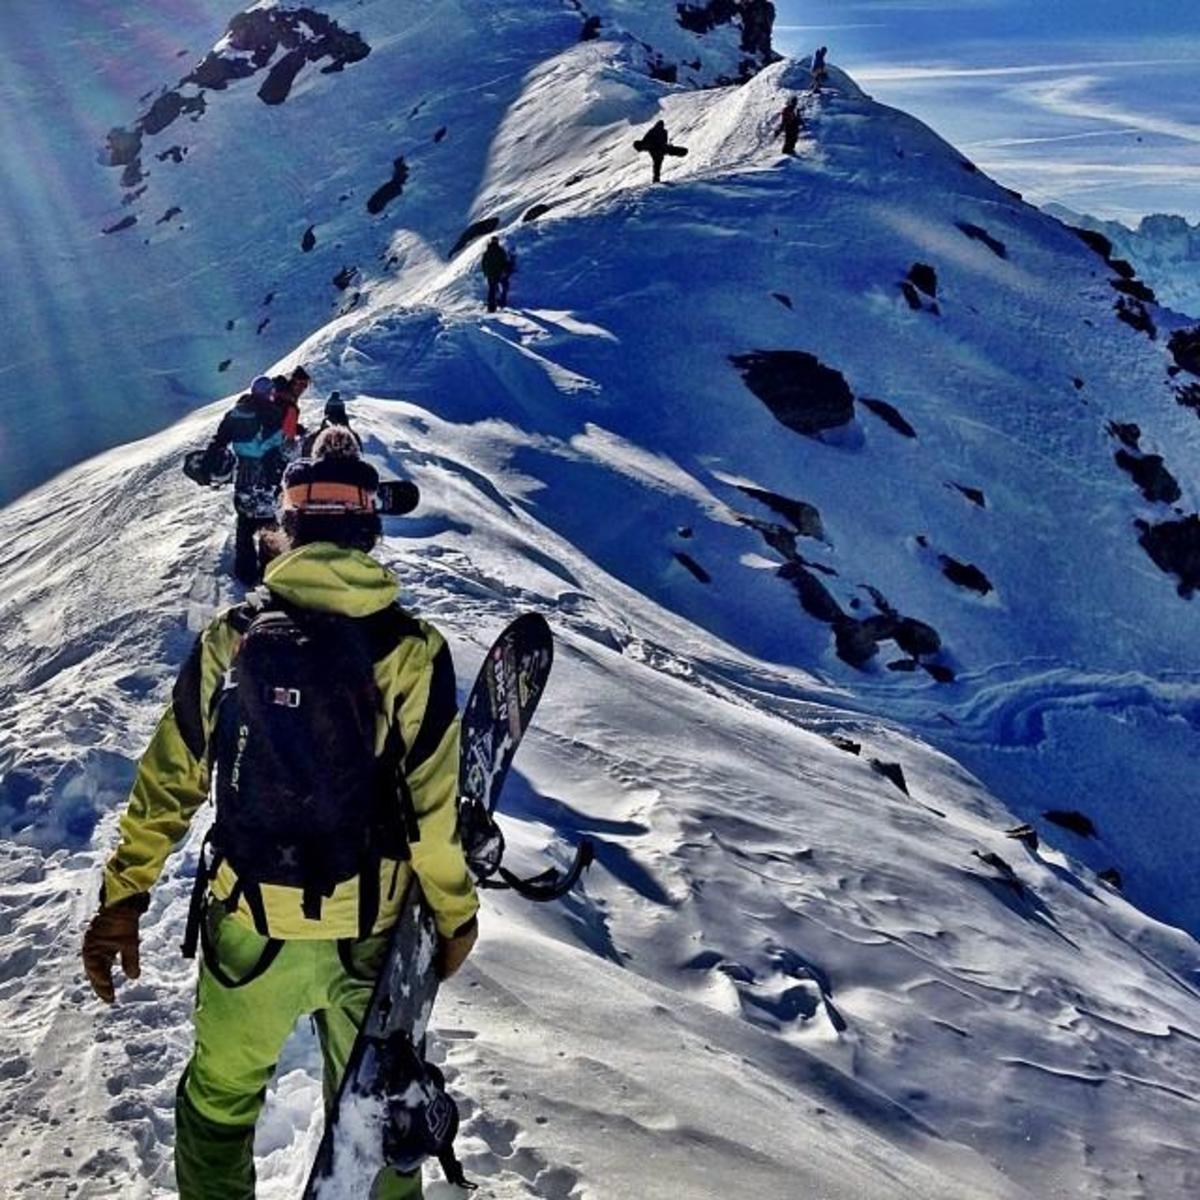 Snowboarder Jeremy Jones treks along the ridge of a mountain with his crew.